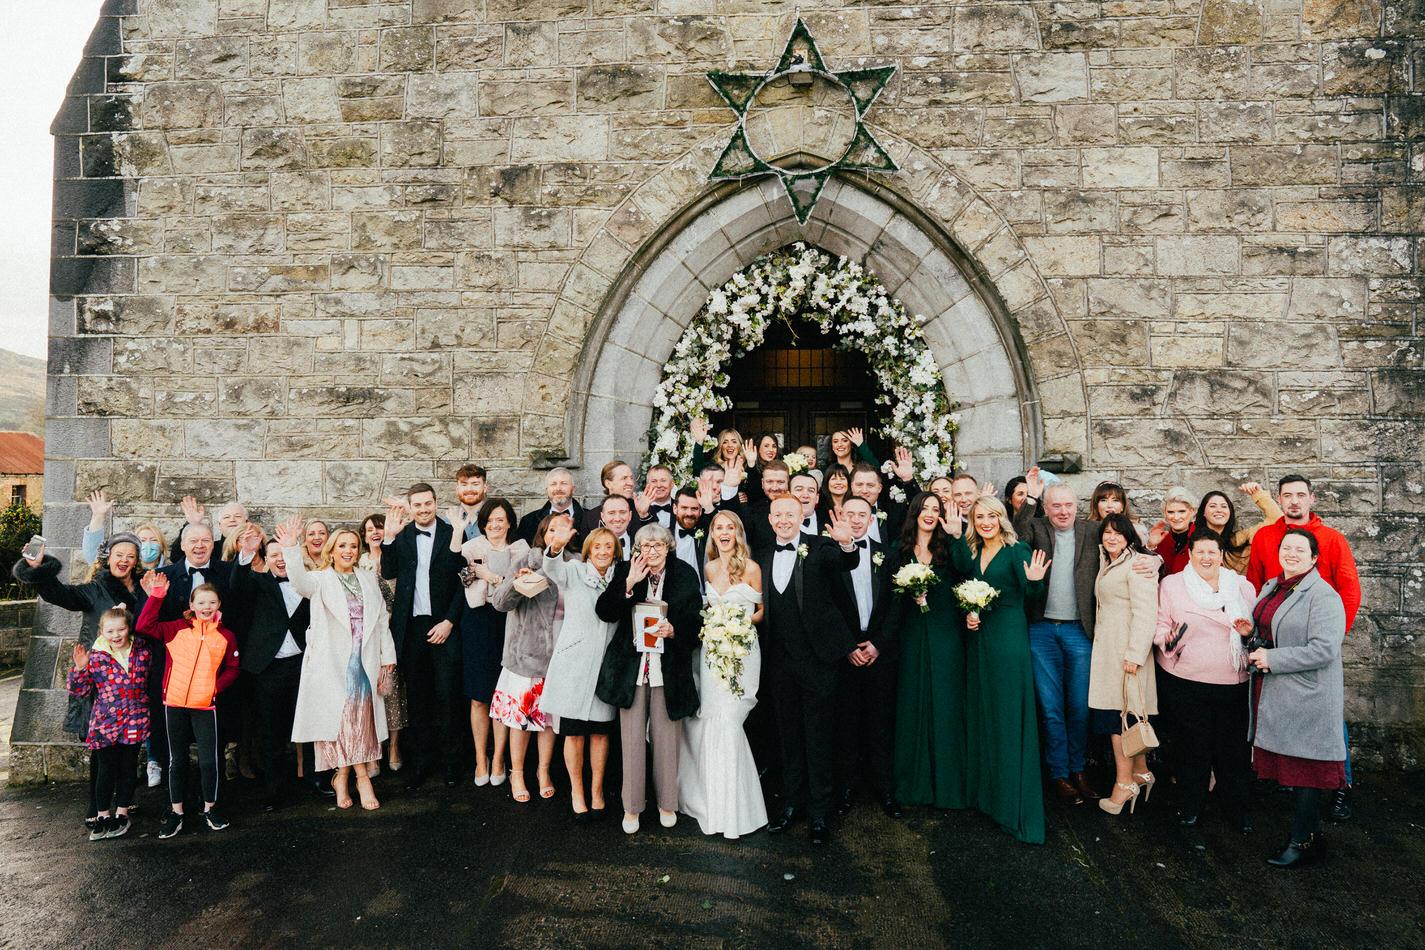 Castle-wedding-ireland-photos- 0171 120